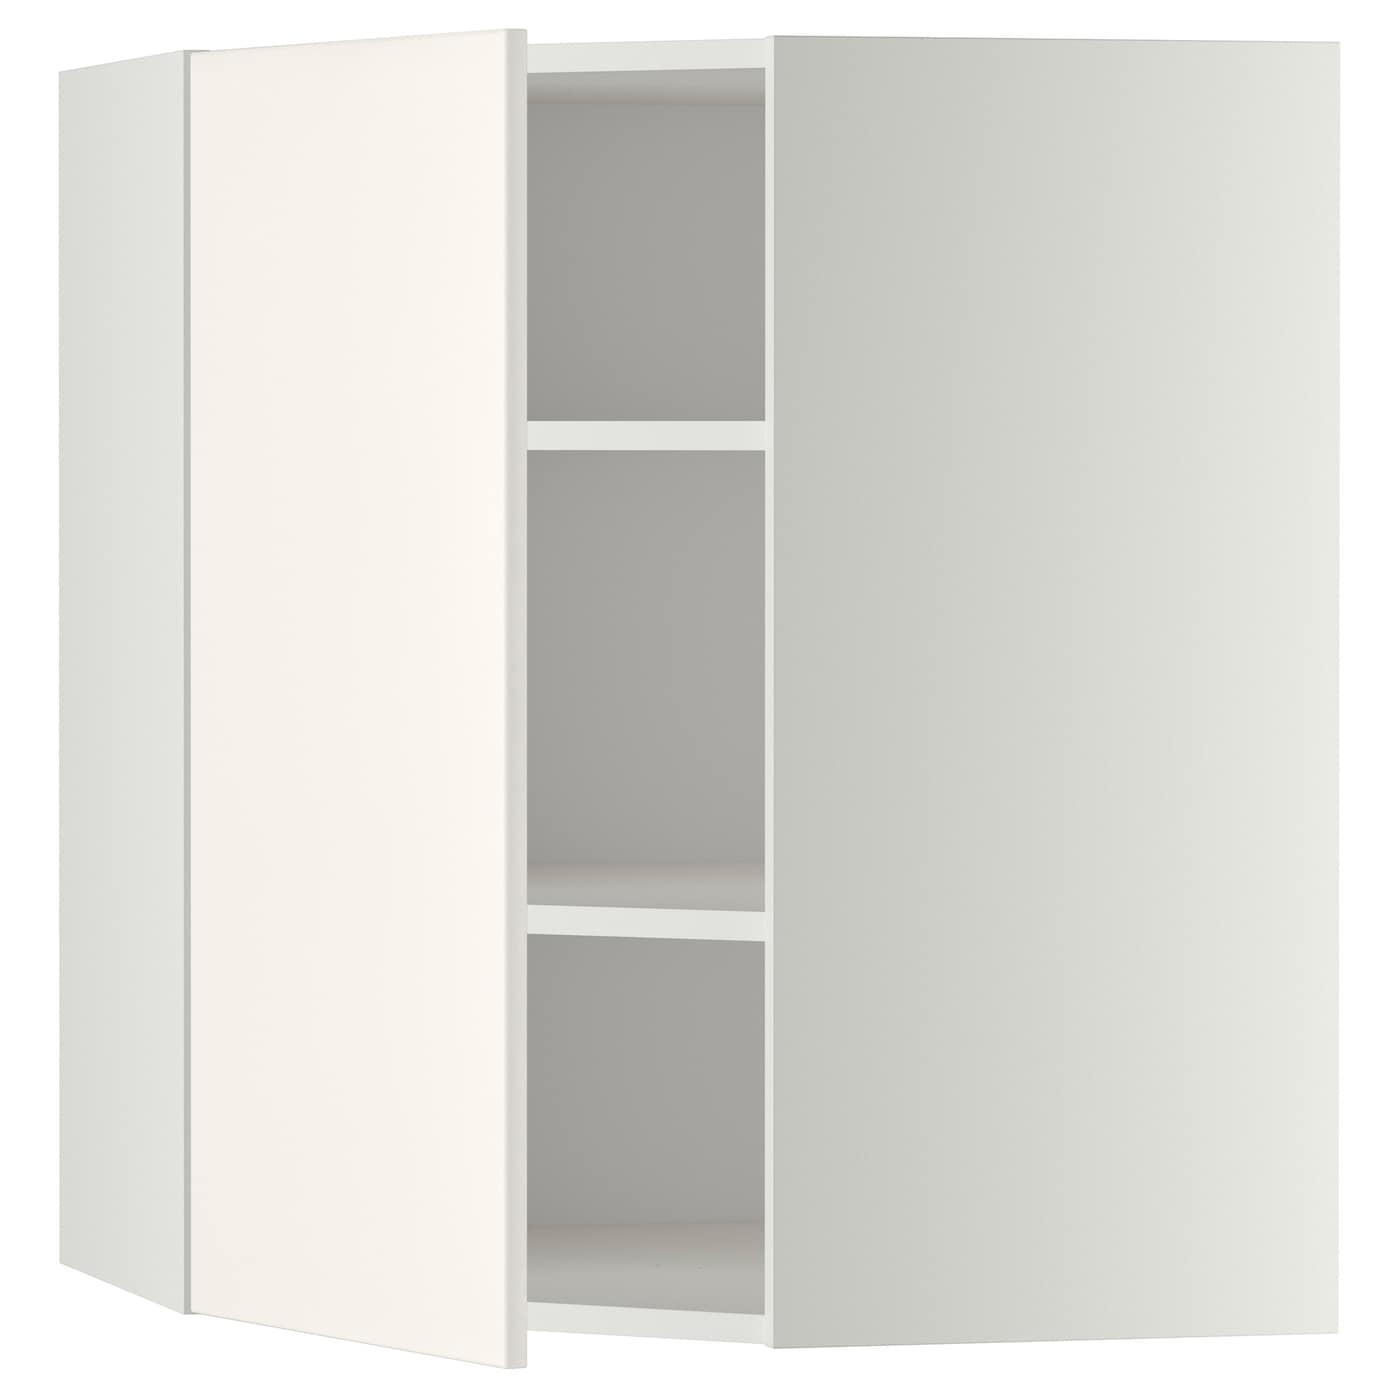 corner base cabinet options wall kitchen ideas design organization upper